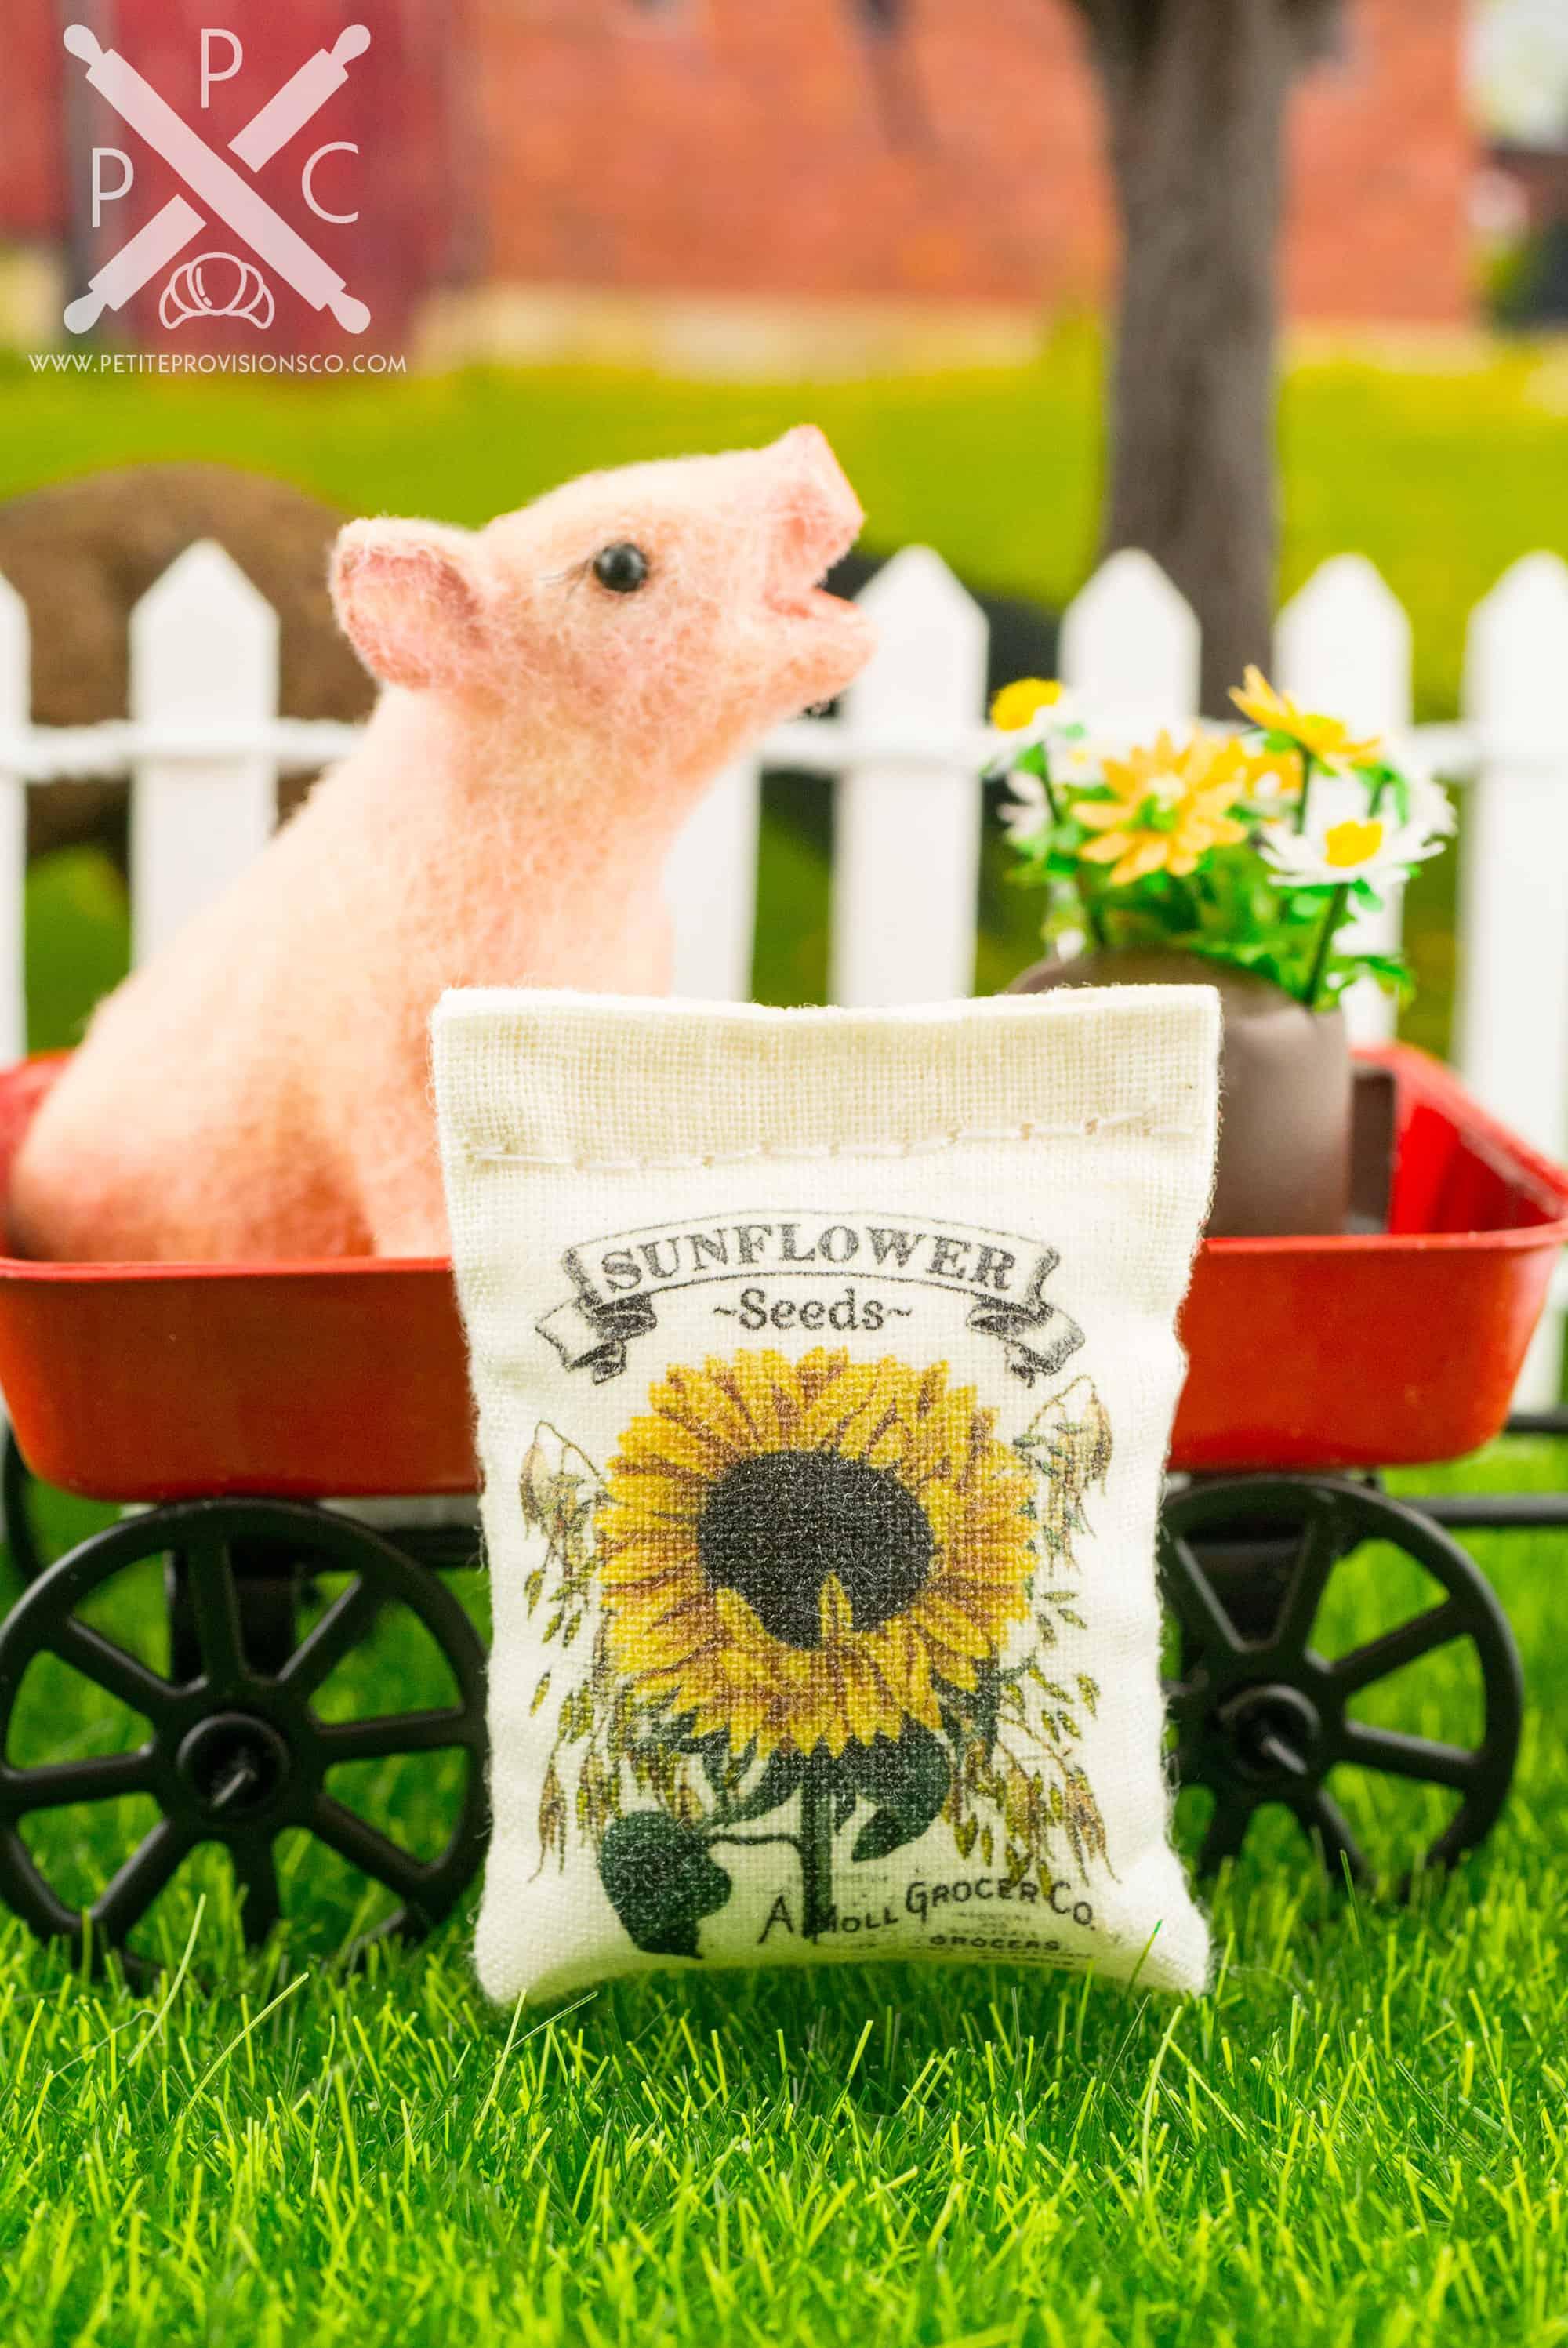 Dollhouse Miniature Sunflower Seeds Bag 1 12 The Pee Provisions Co